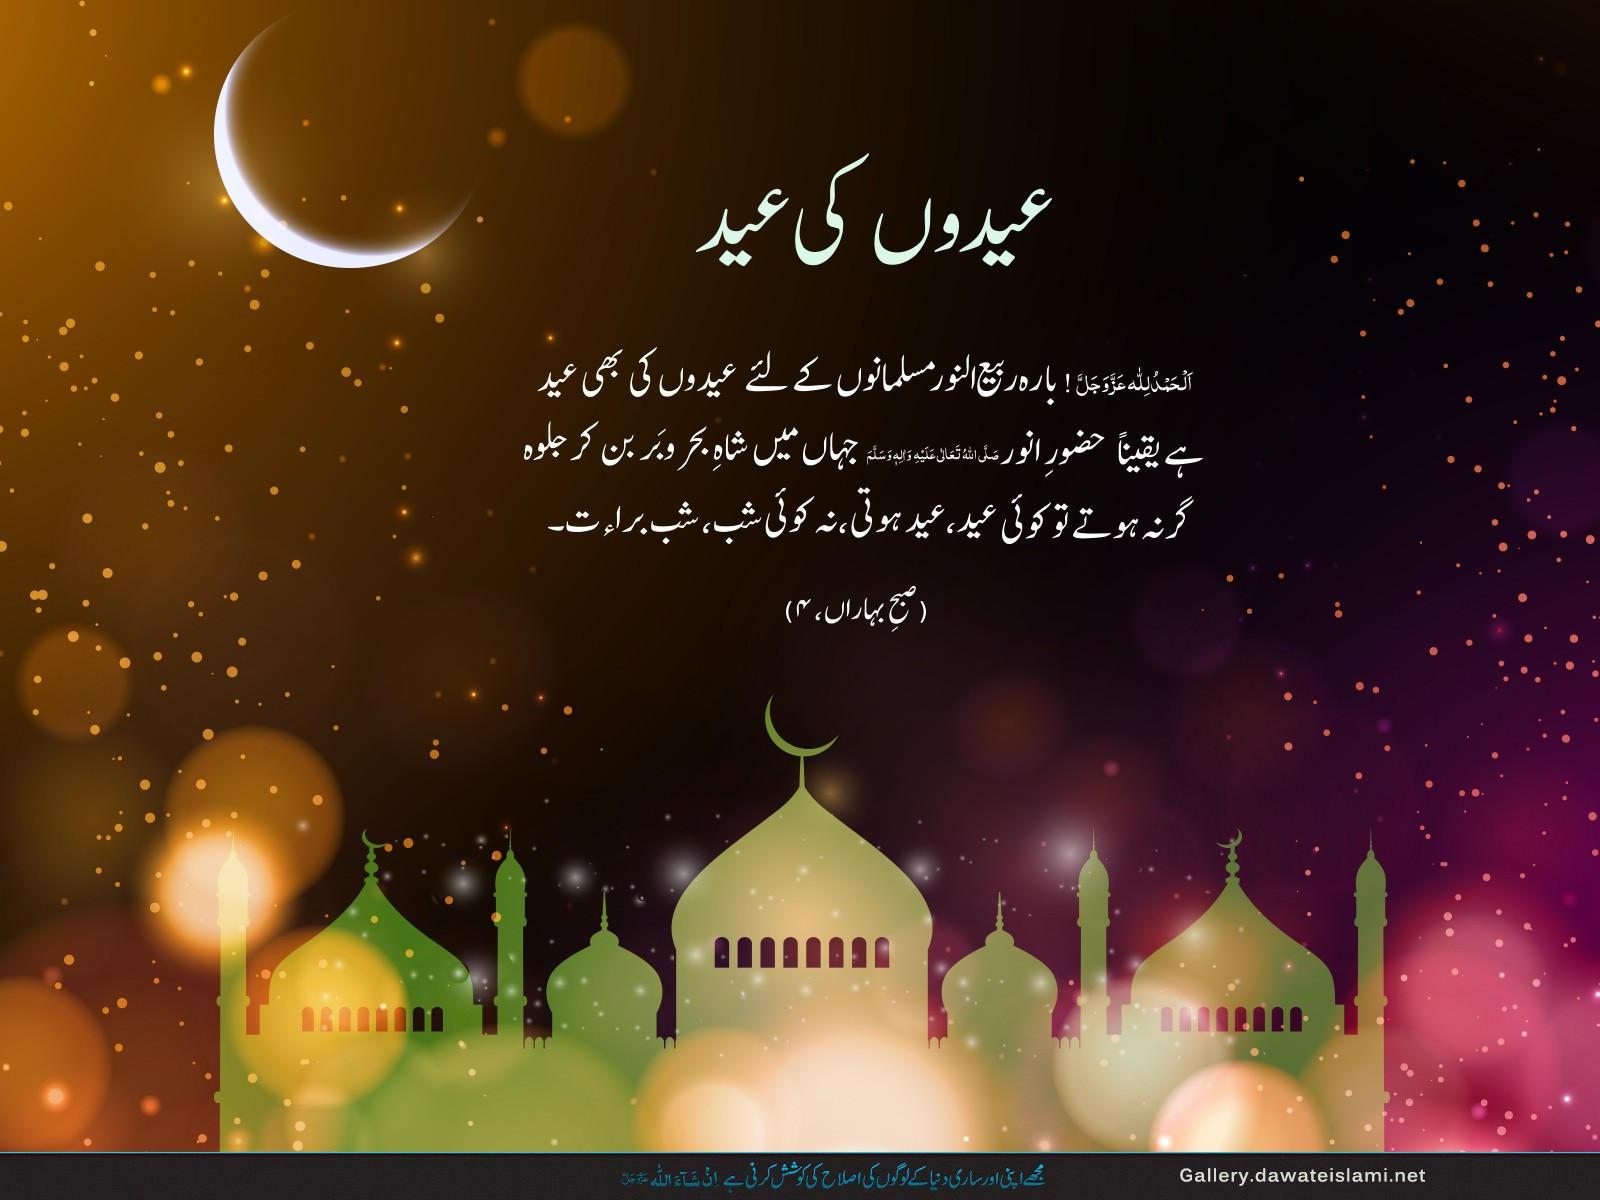 Eidon ki eid- Rabi un noor wallpaper